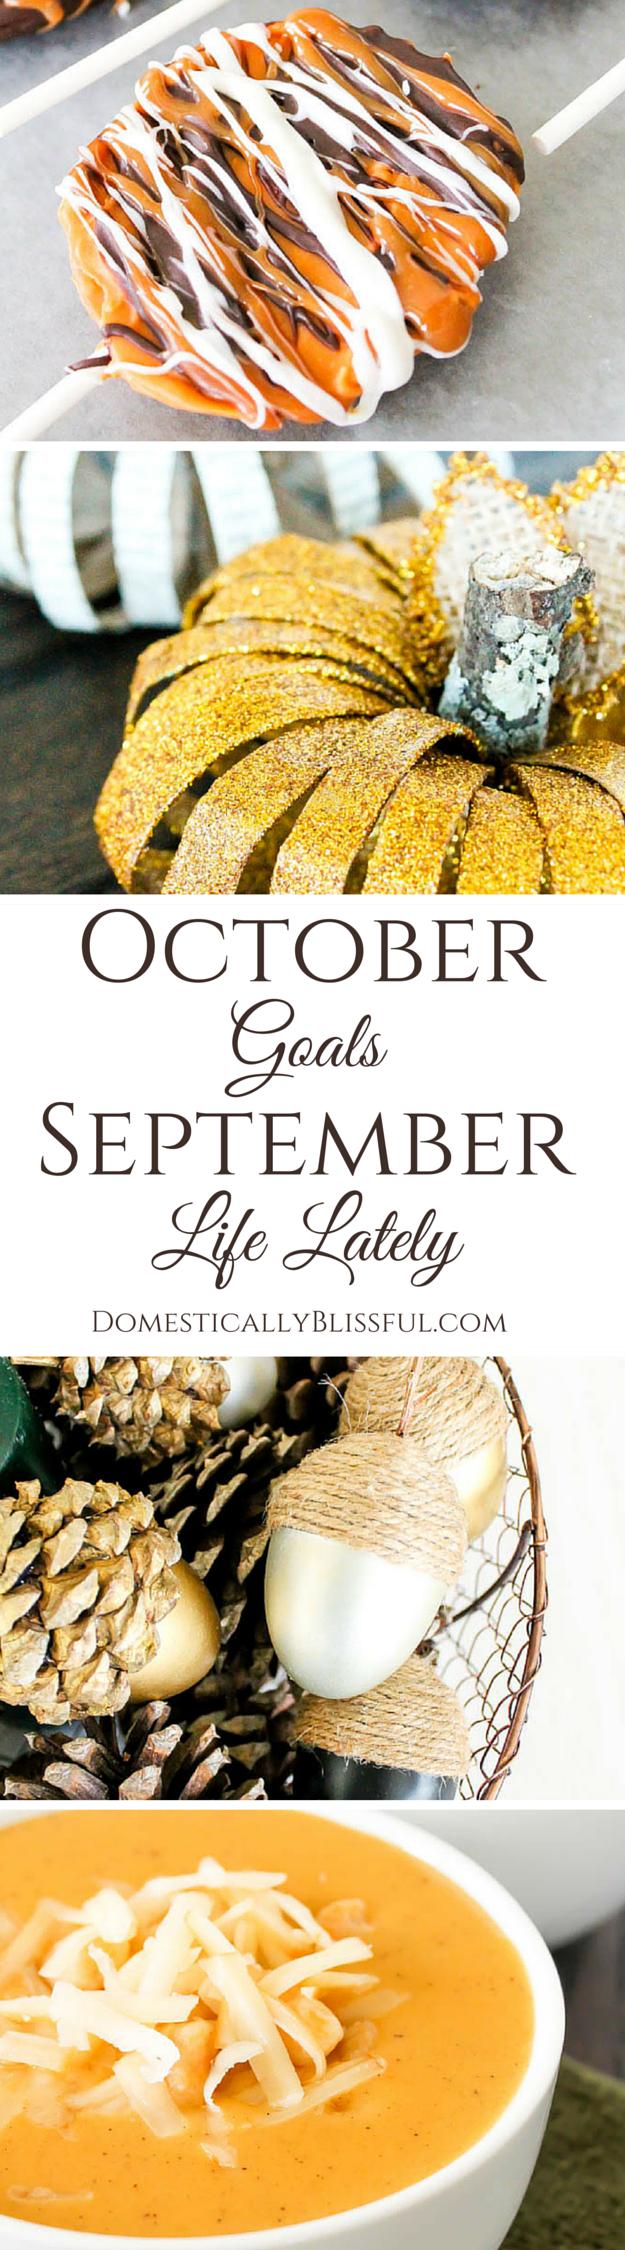 Domestically Blissful's October Goals & September Life Lately